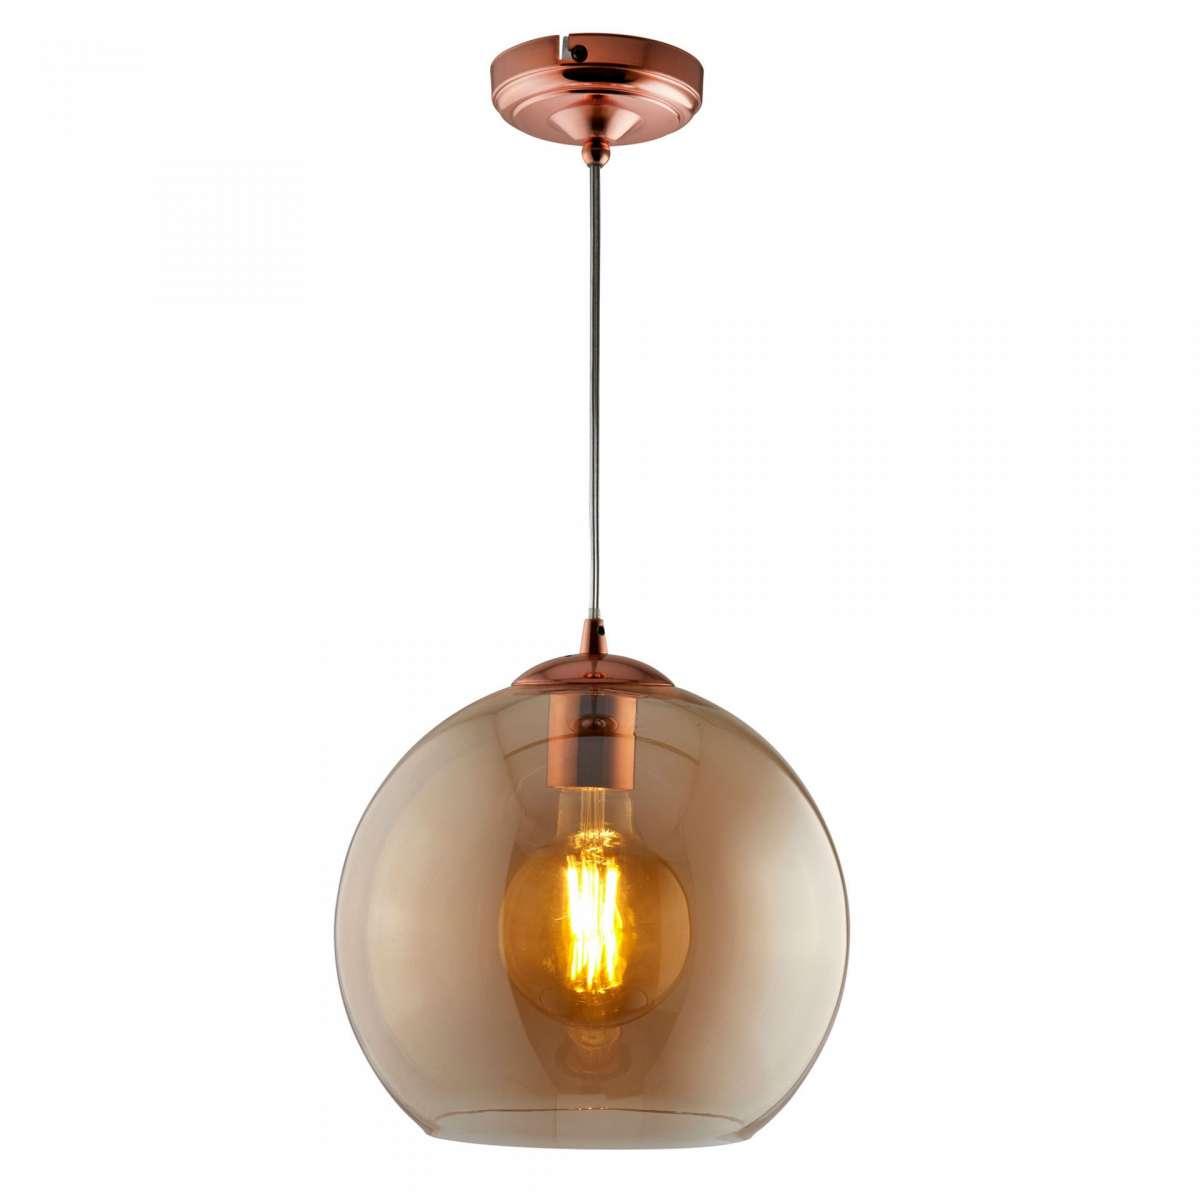 Balls Singe Pendant Round 350mm Amber Glass Antique Brass